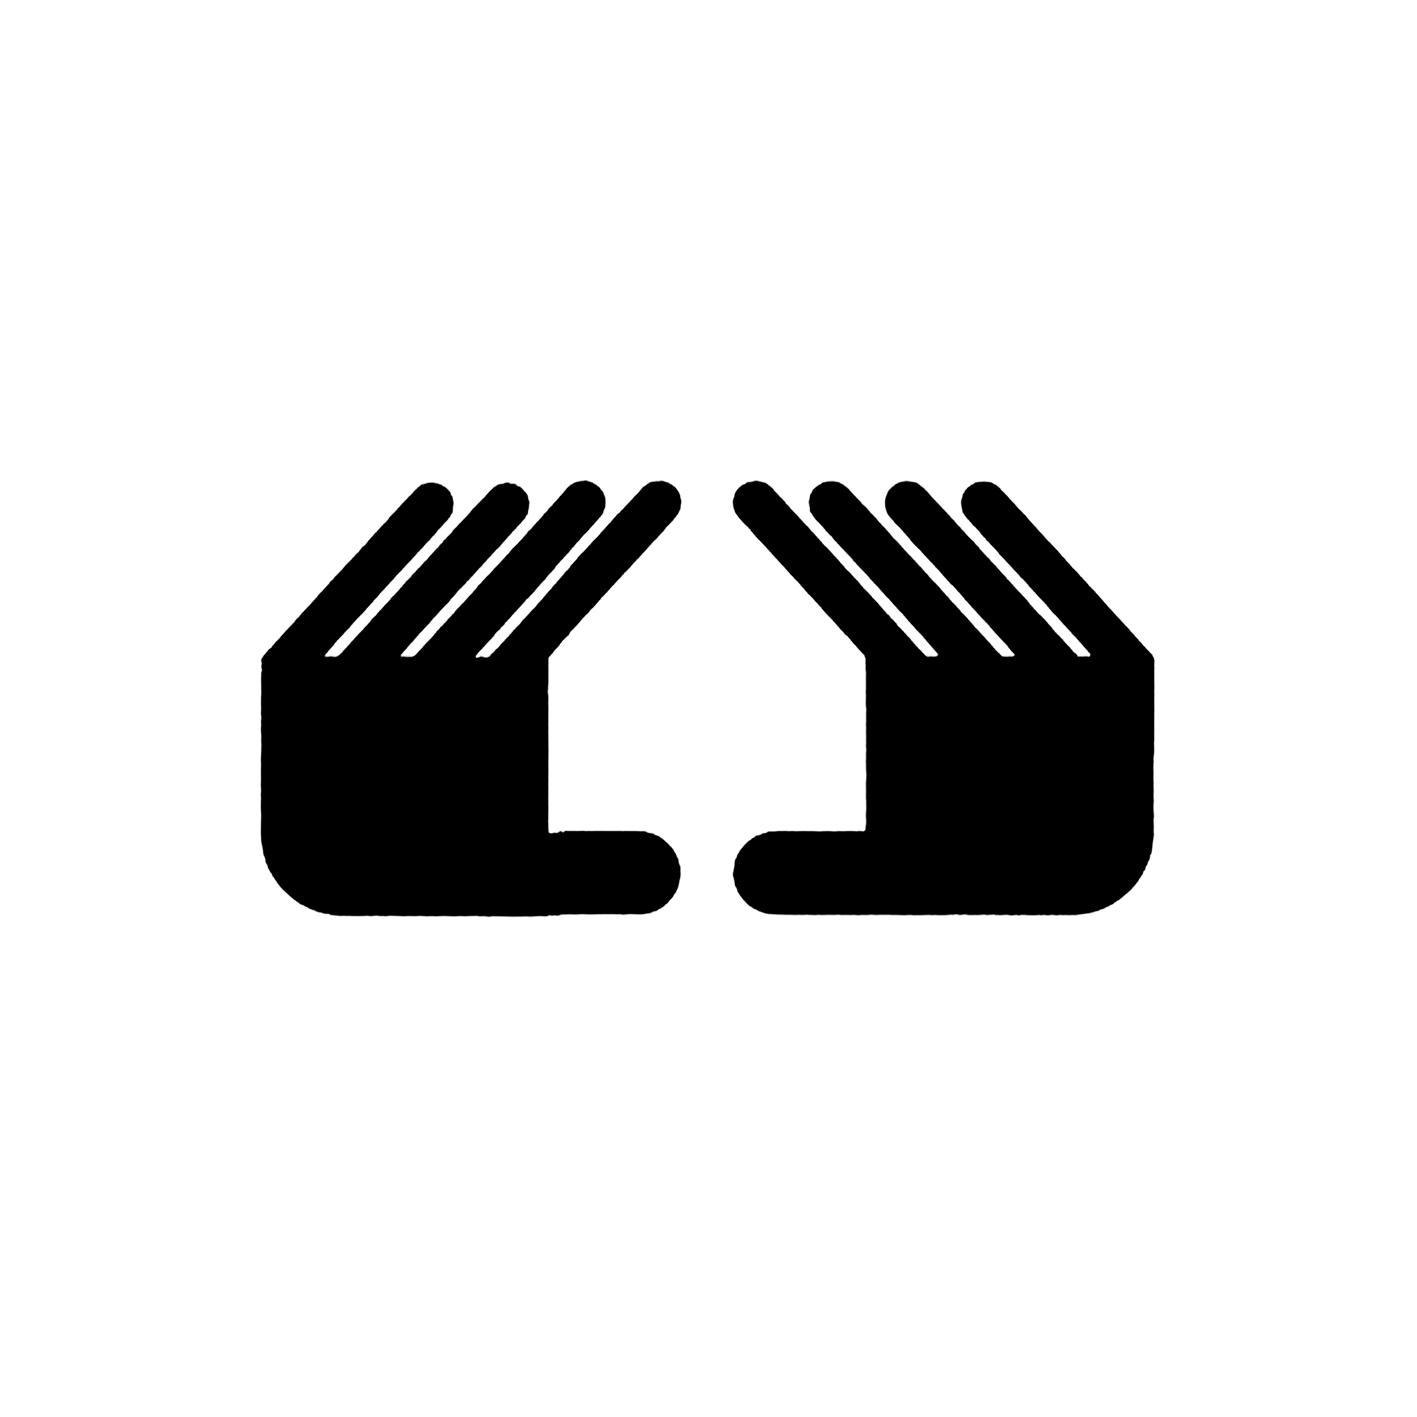 habitat for humanity logo graphis